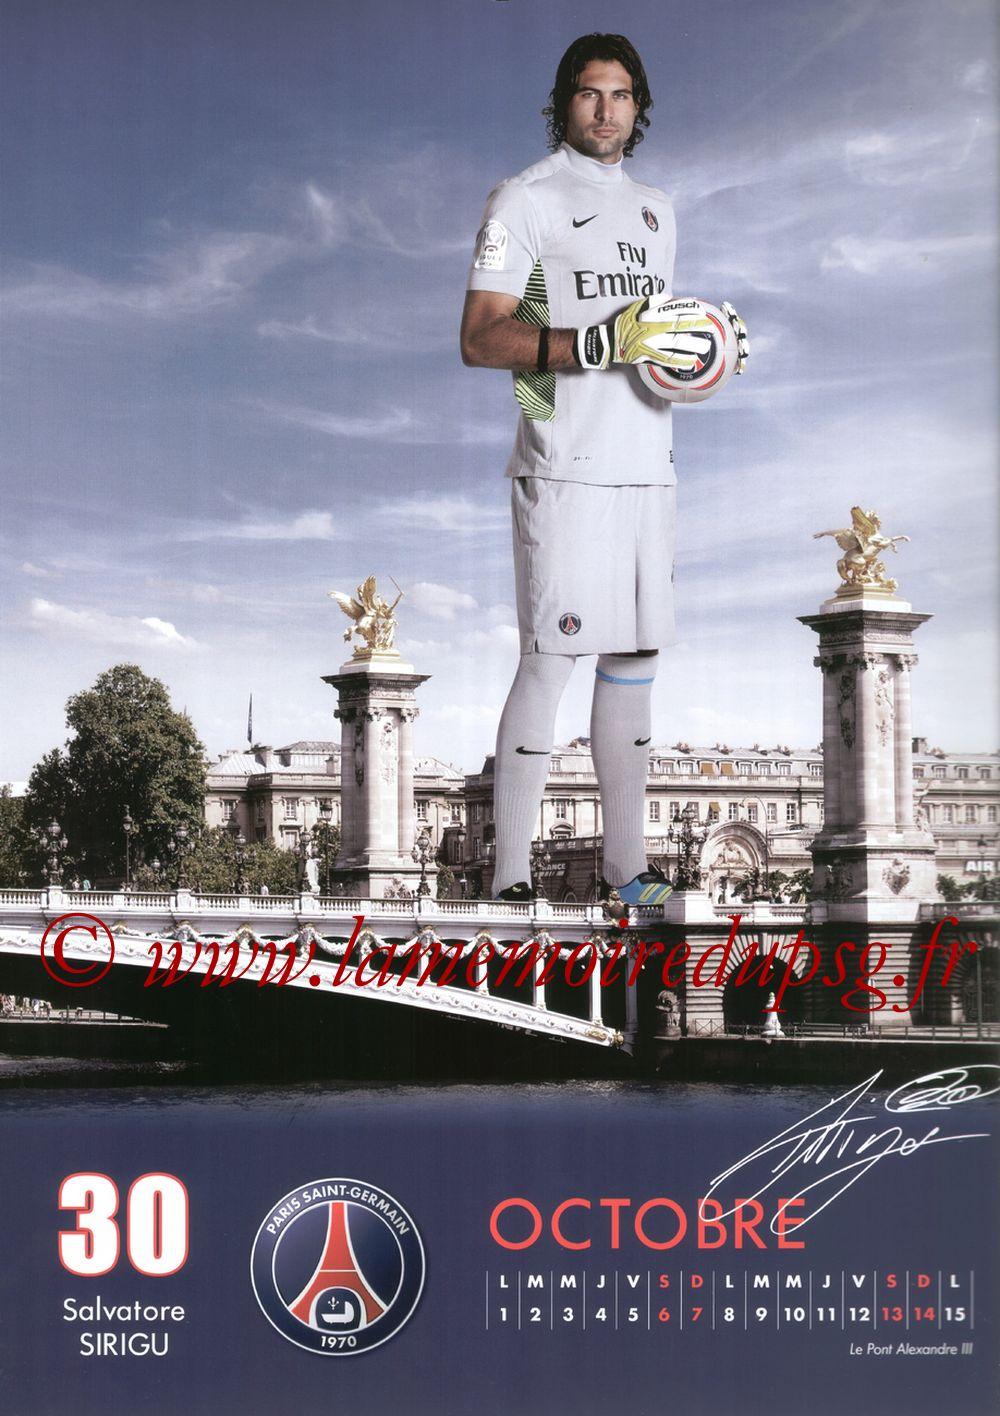 Calendrier PSG 2012 - Page 19 - Salvatore SIRIGU